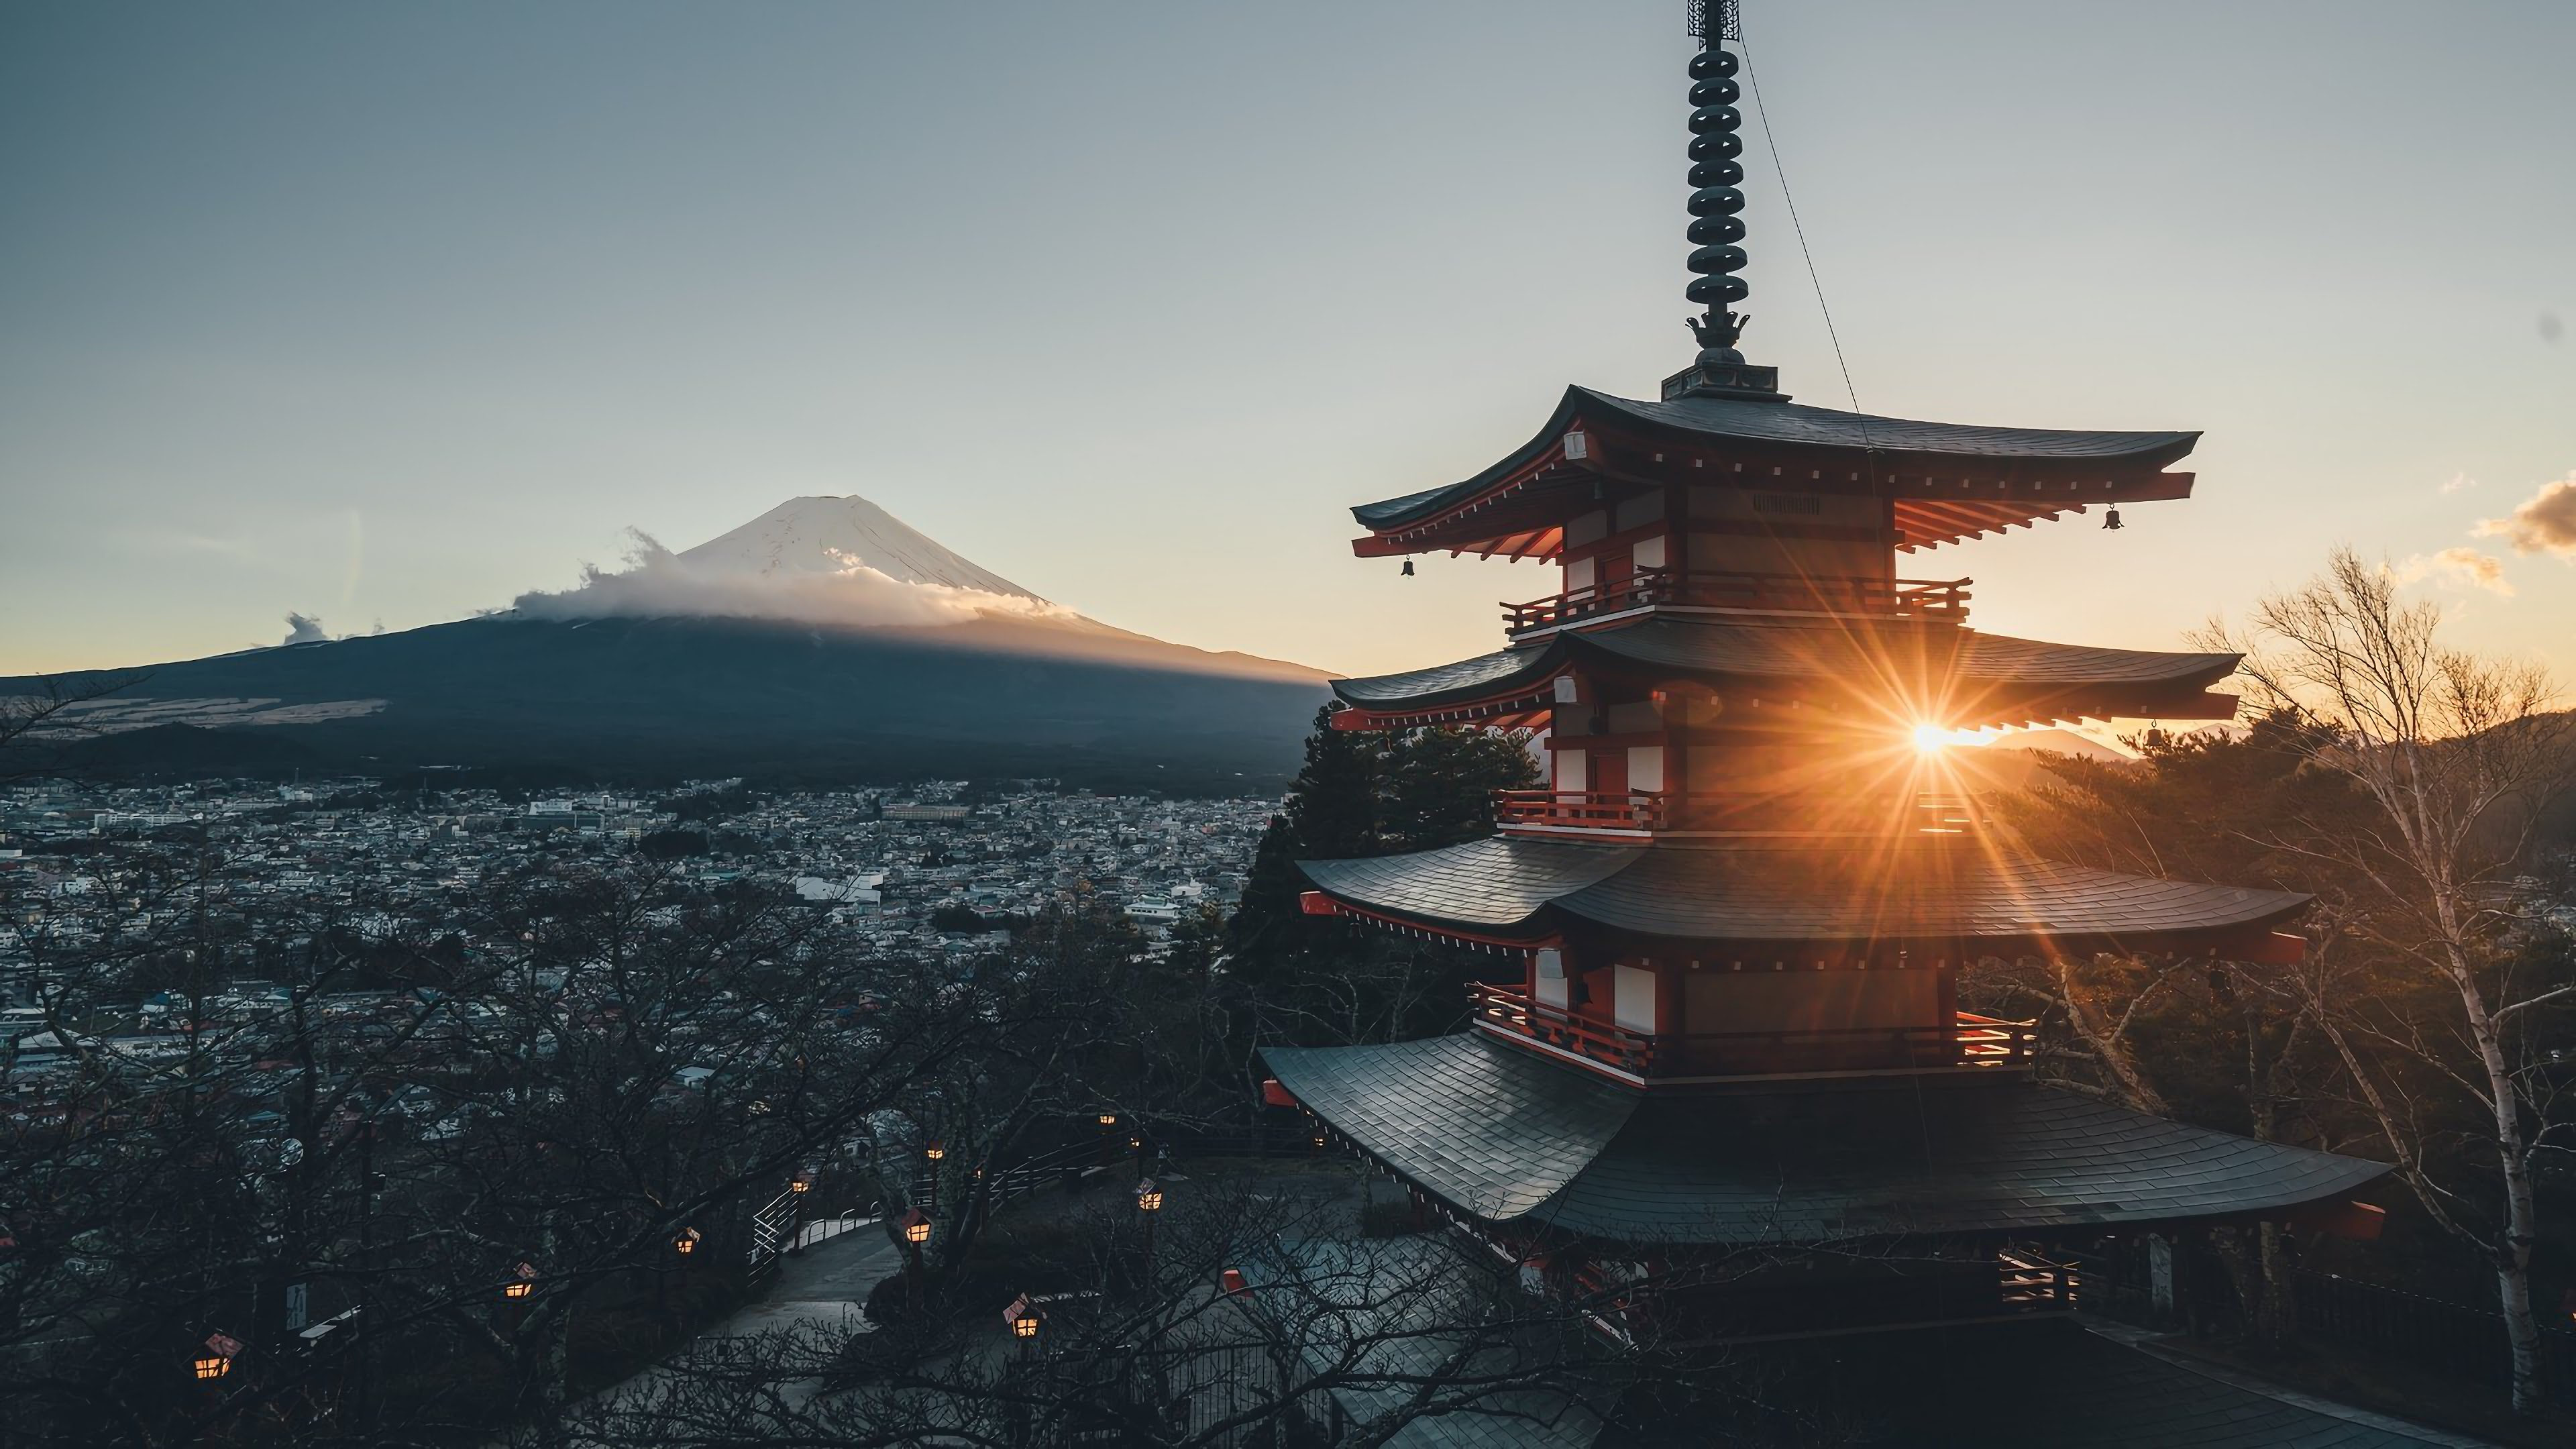 Wallpaper Mount Fuji and Japan City